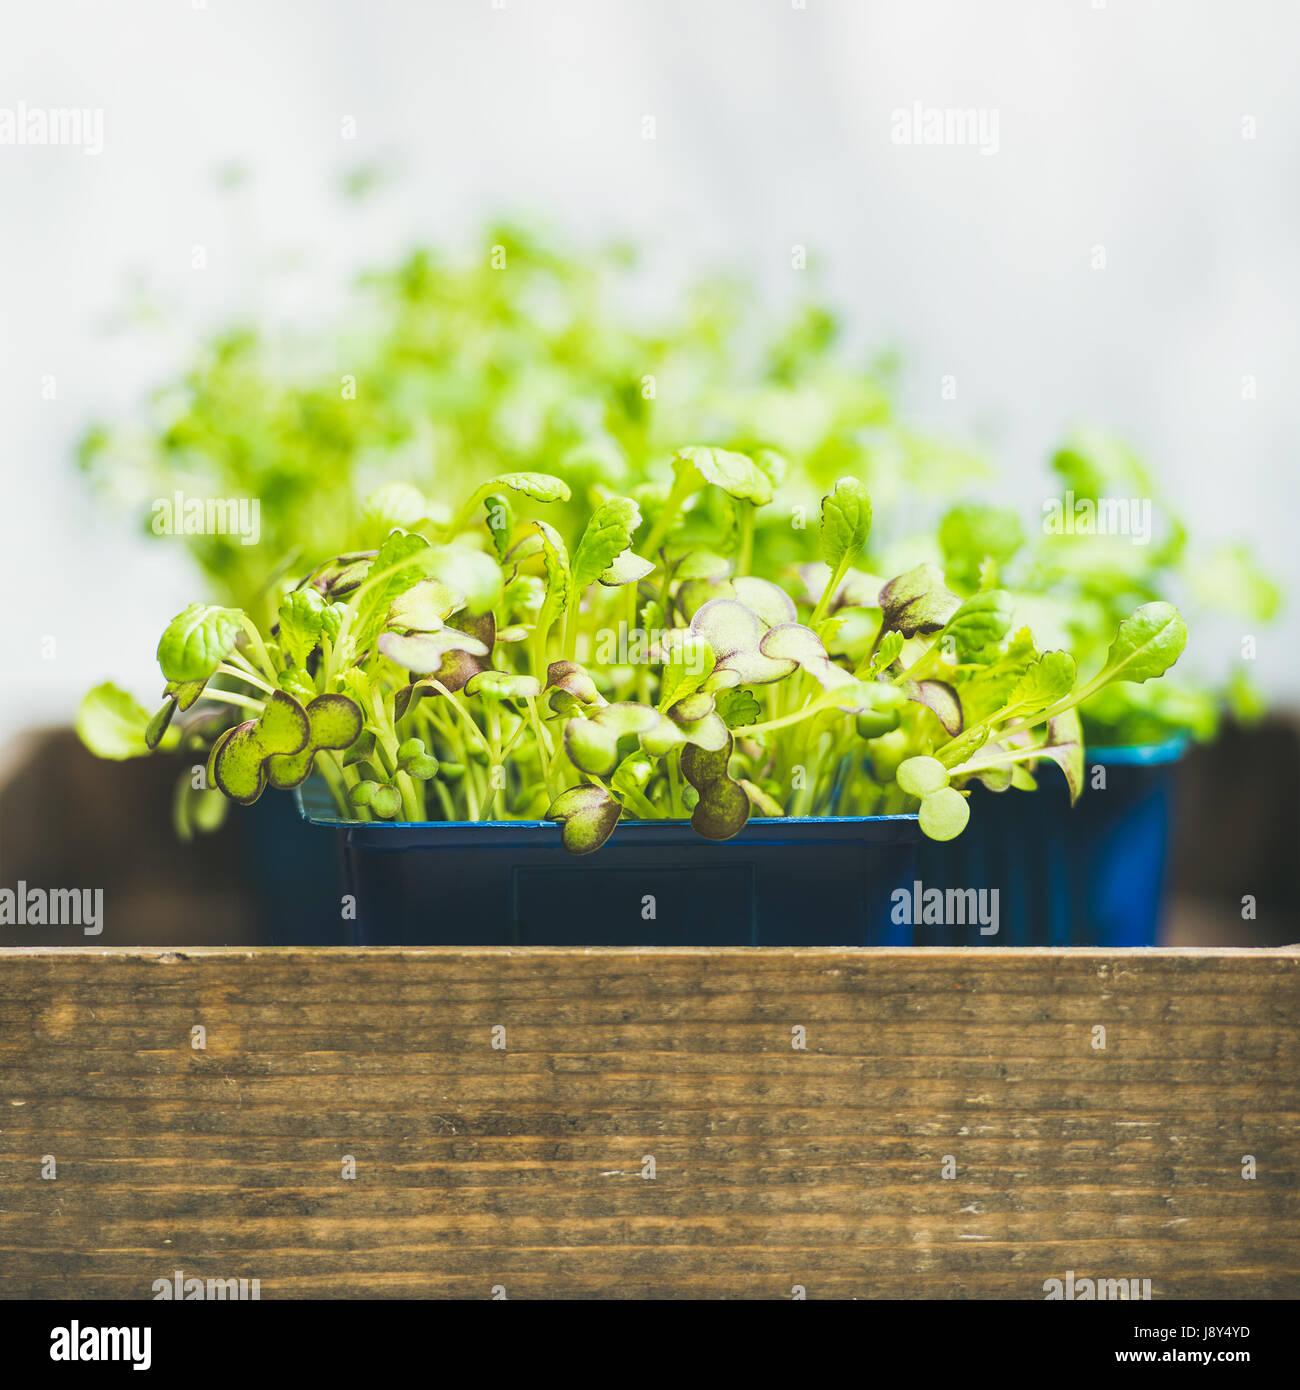 Frische Frühlingsluft grüne live Rettich Kress Sprossen, quadratische Ernte Stockbild